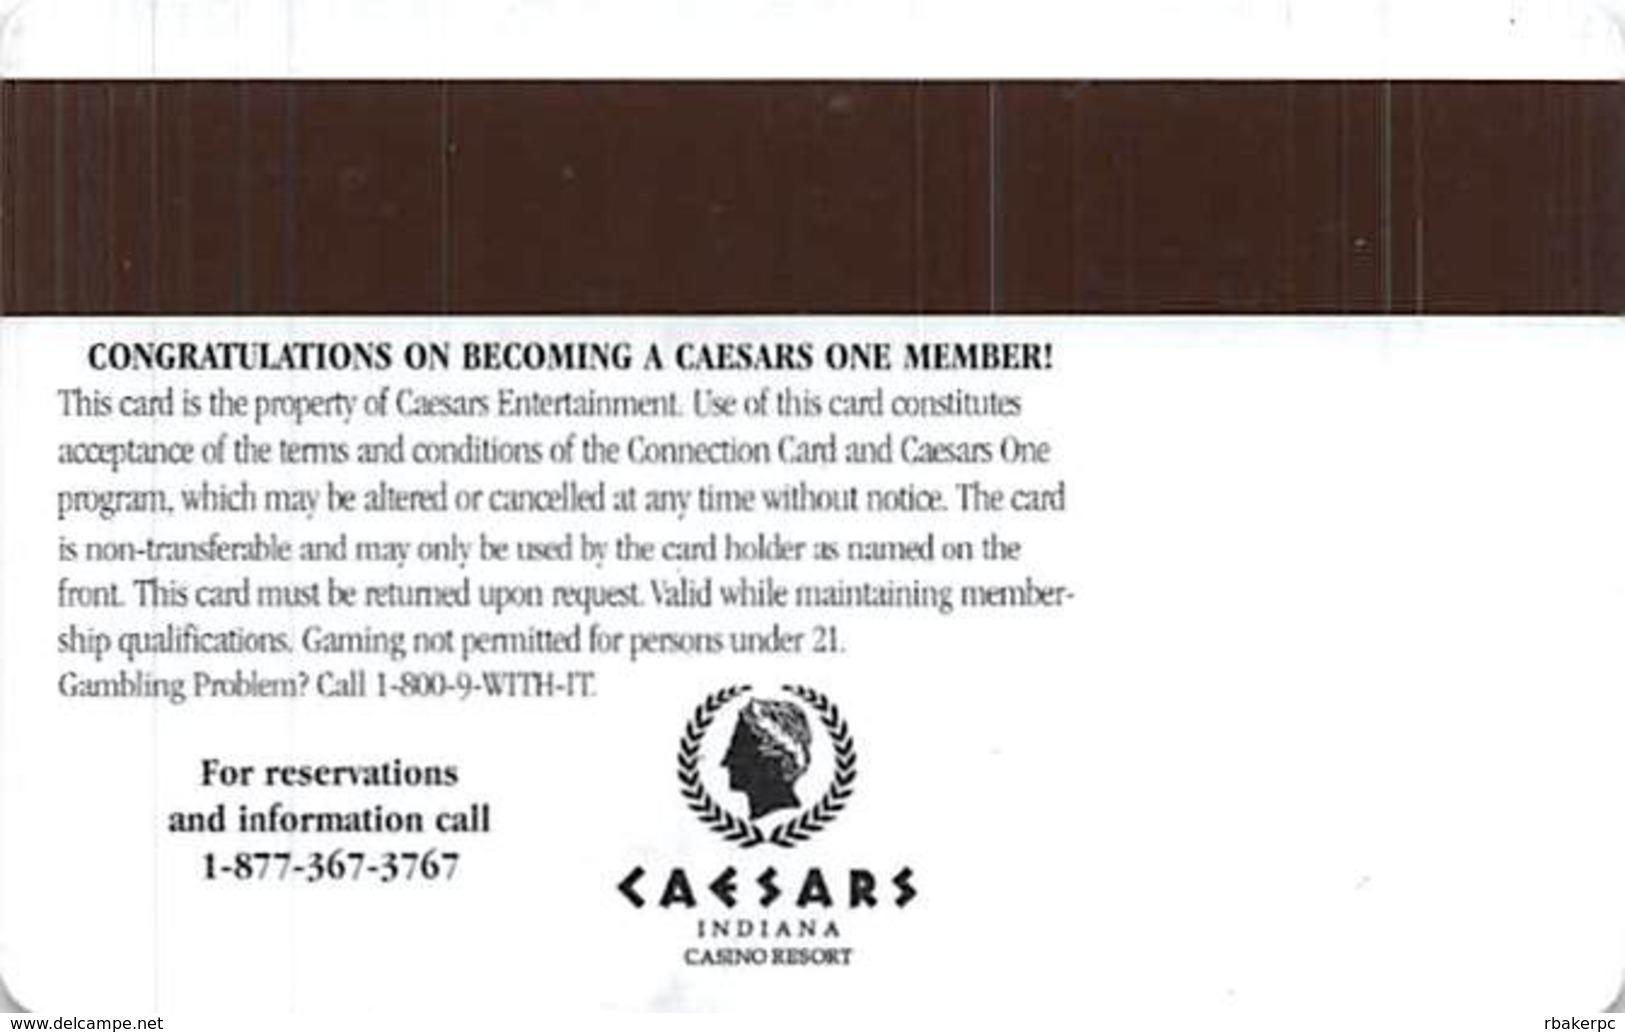 Caesars Casino - Corvdon, IN - Caesars One Slot Card With Purple Strip - Casino Cards